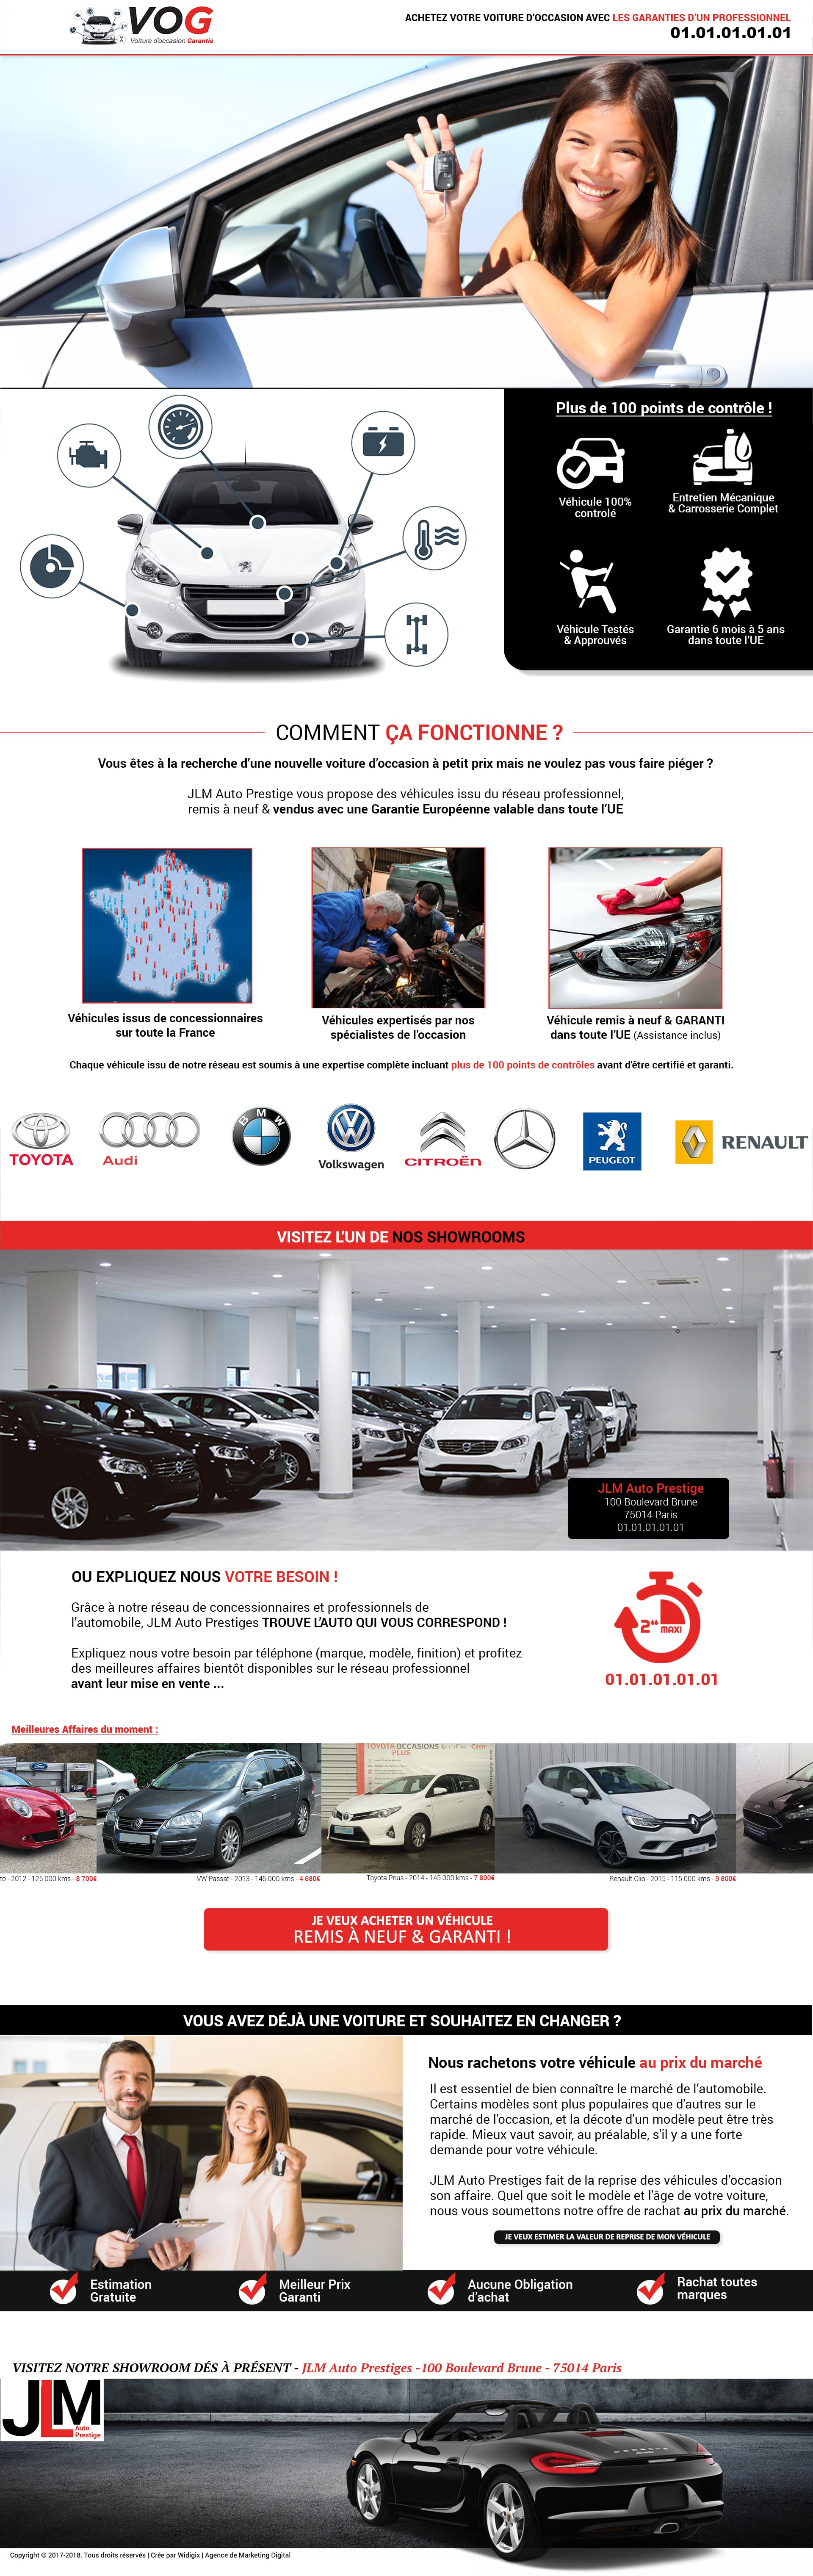 JLM-Landing-Page-Agence-webmarketing-Paris-min